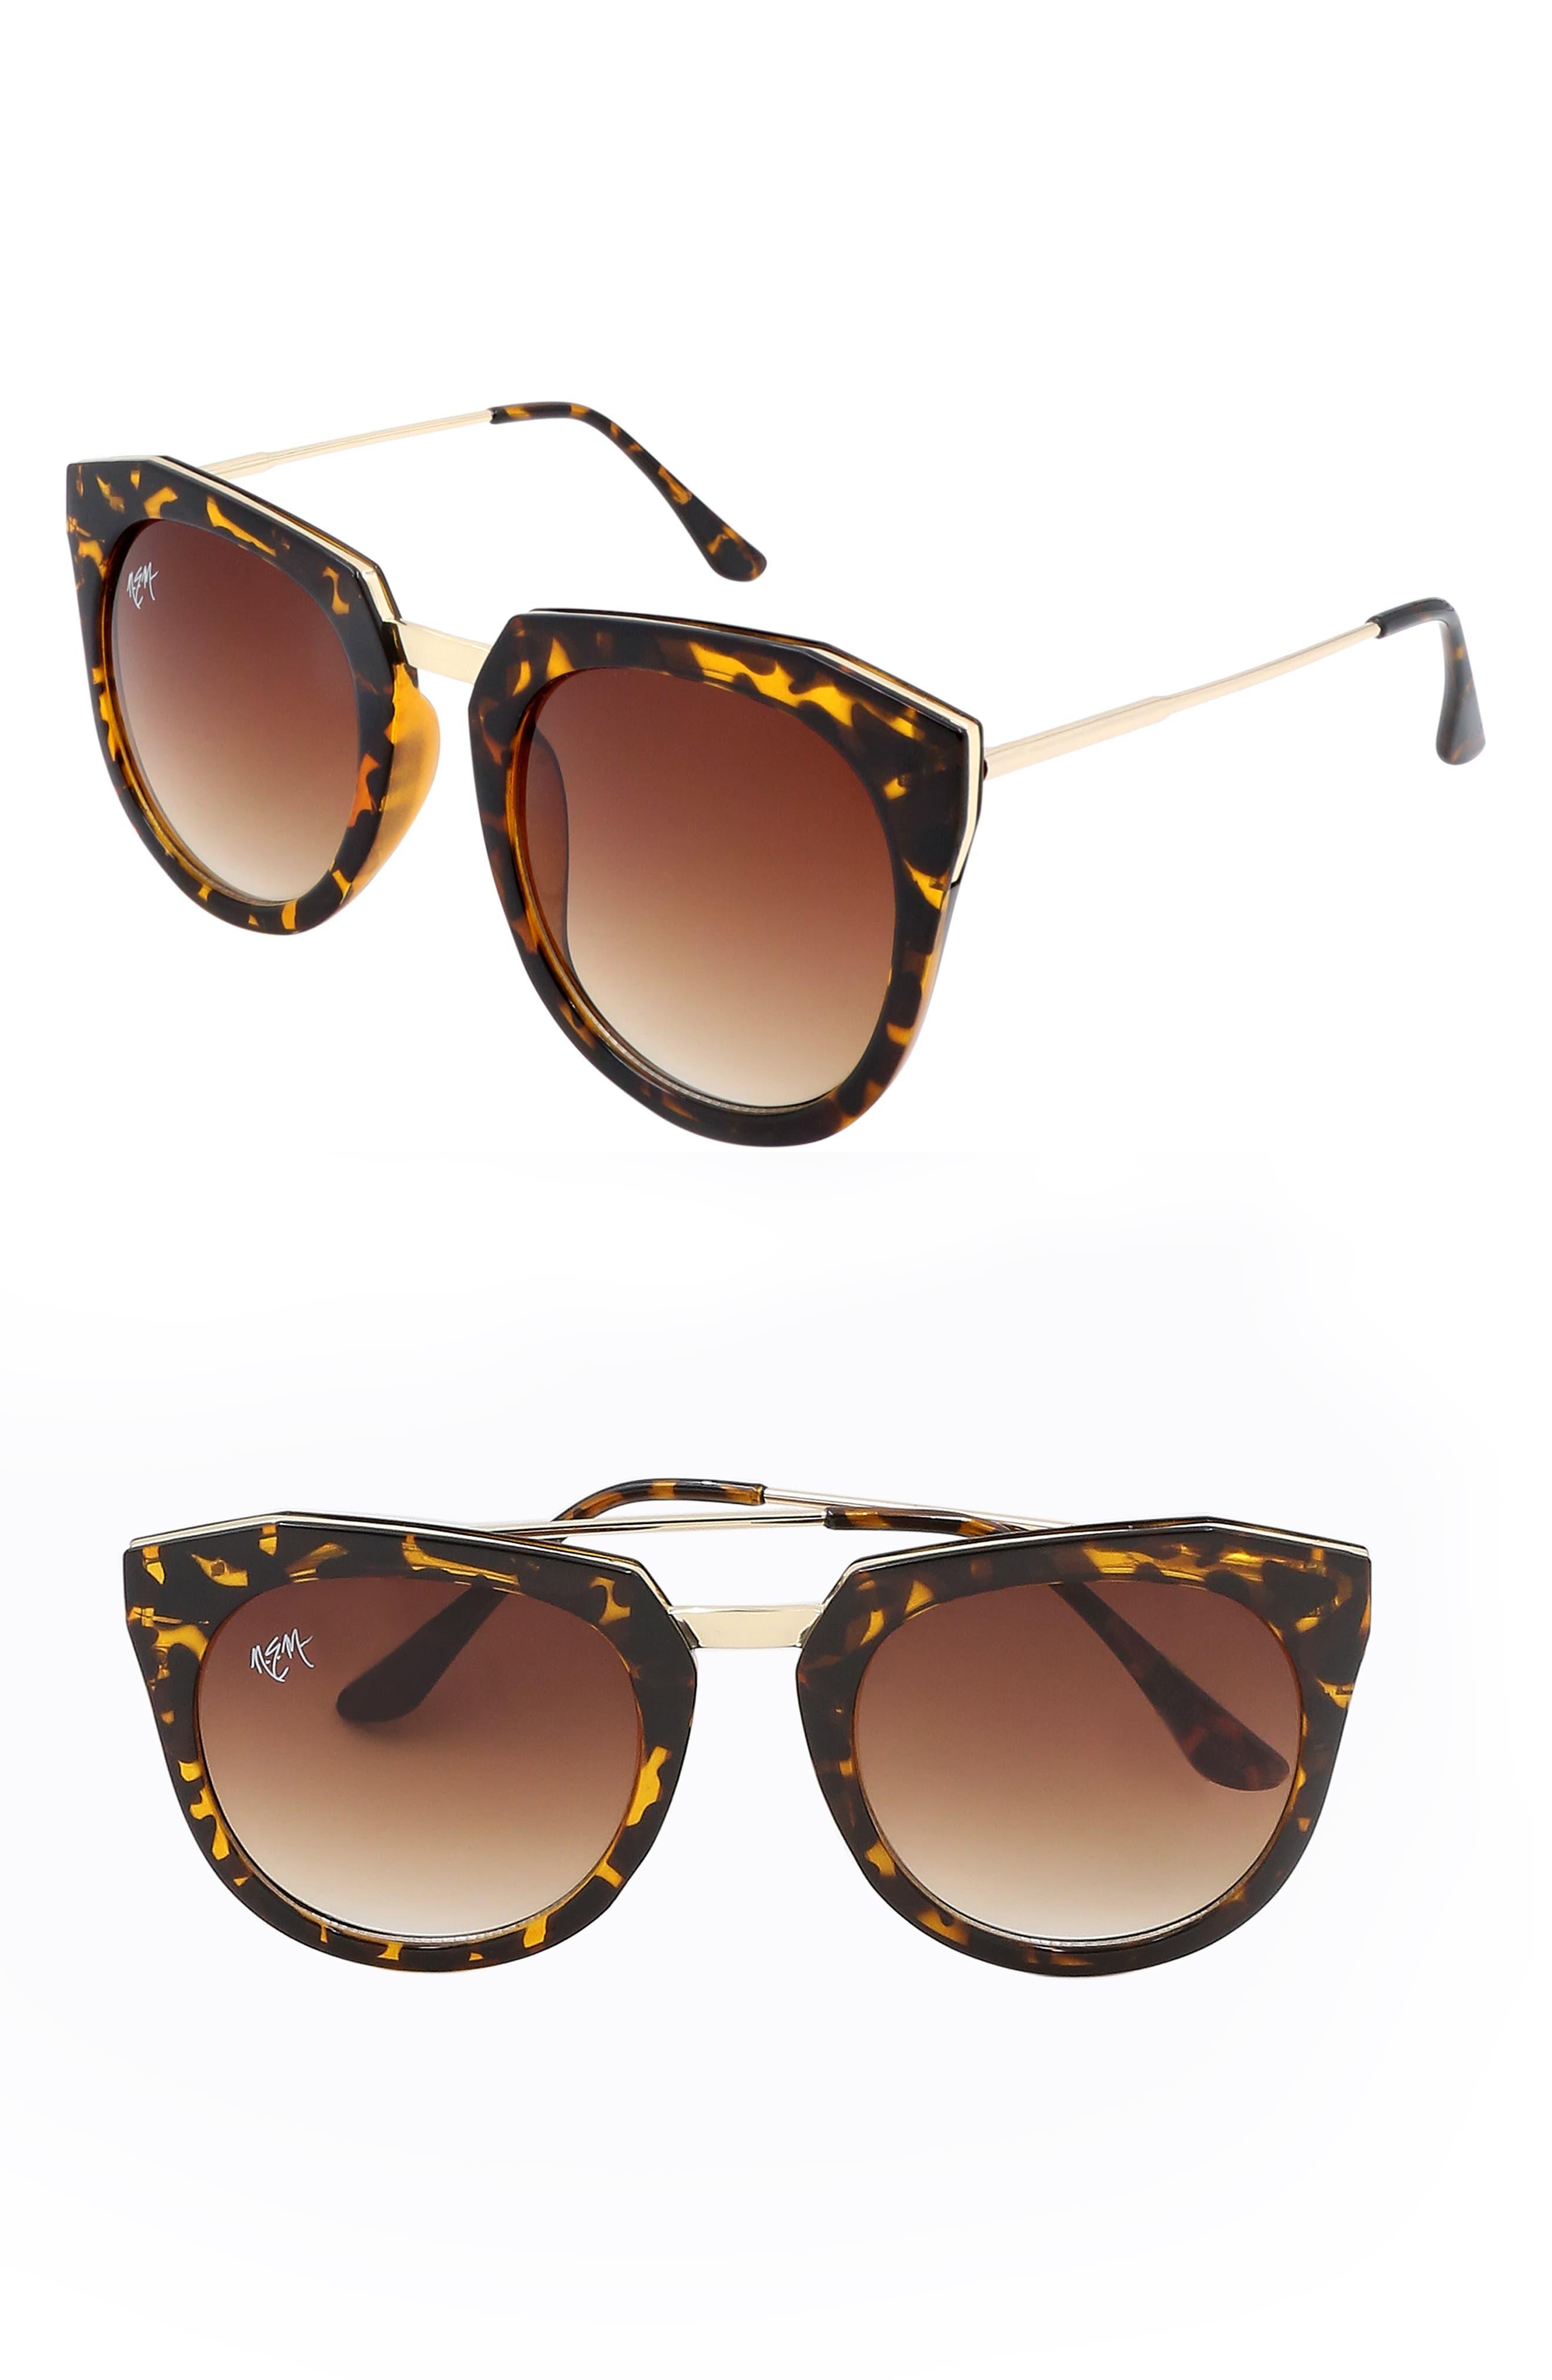 Nem Haute Line 55Mm Angular Sunglasses - Clear Brown W Amber Lens